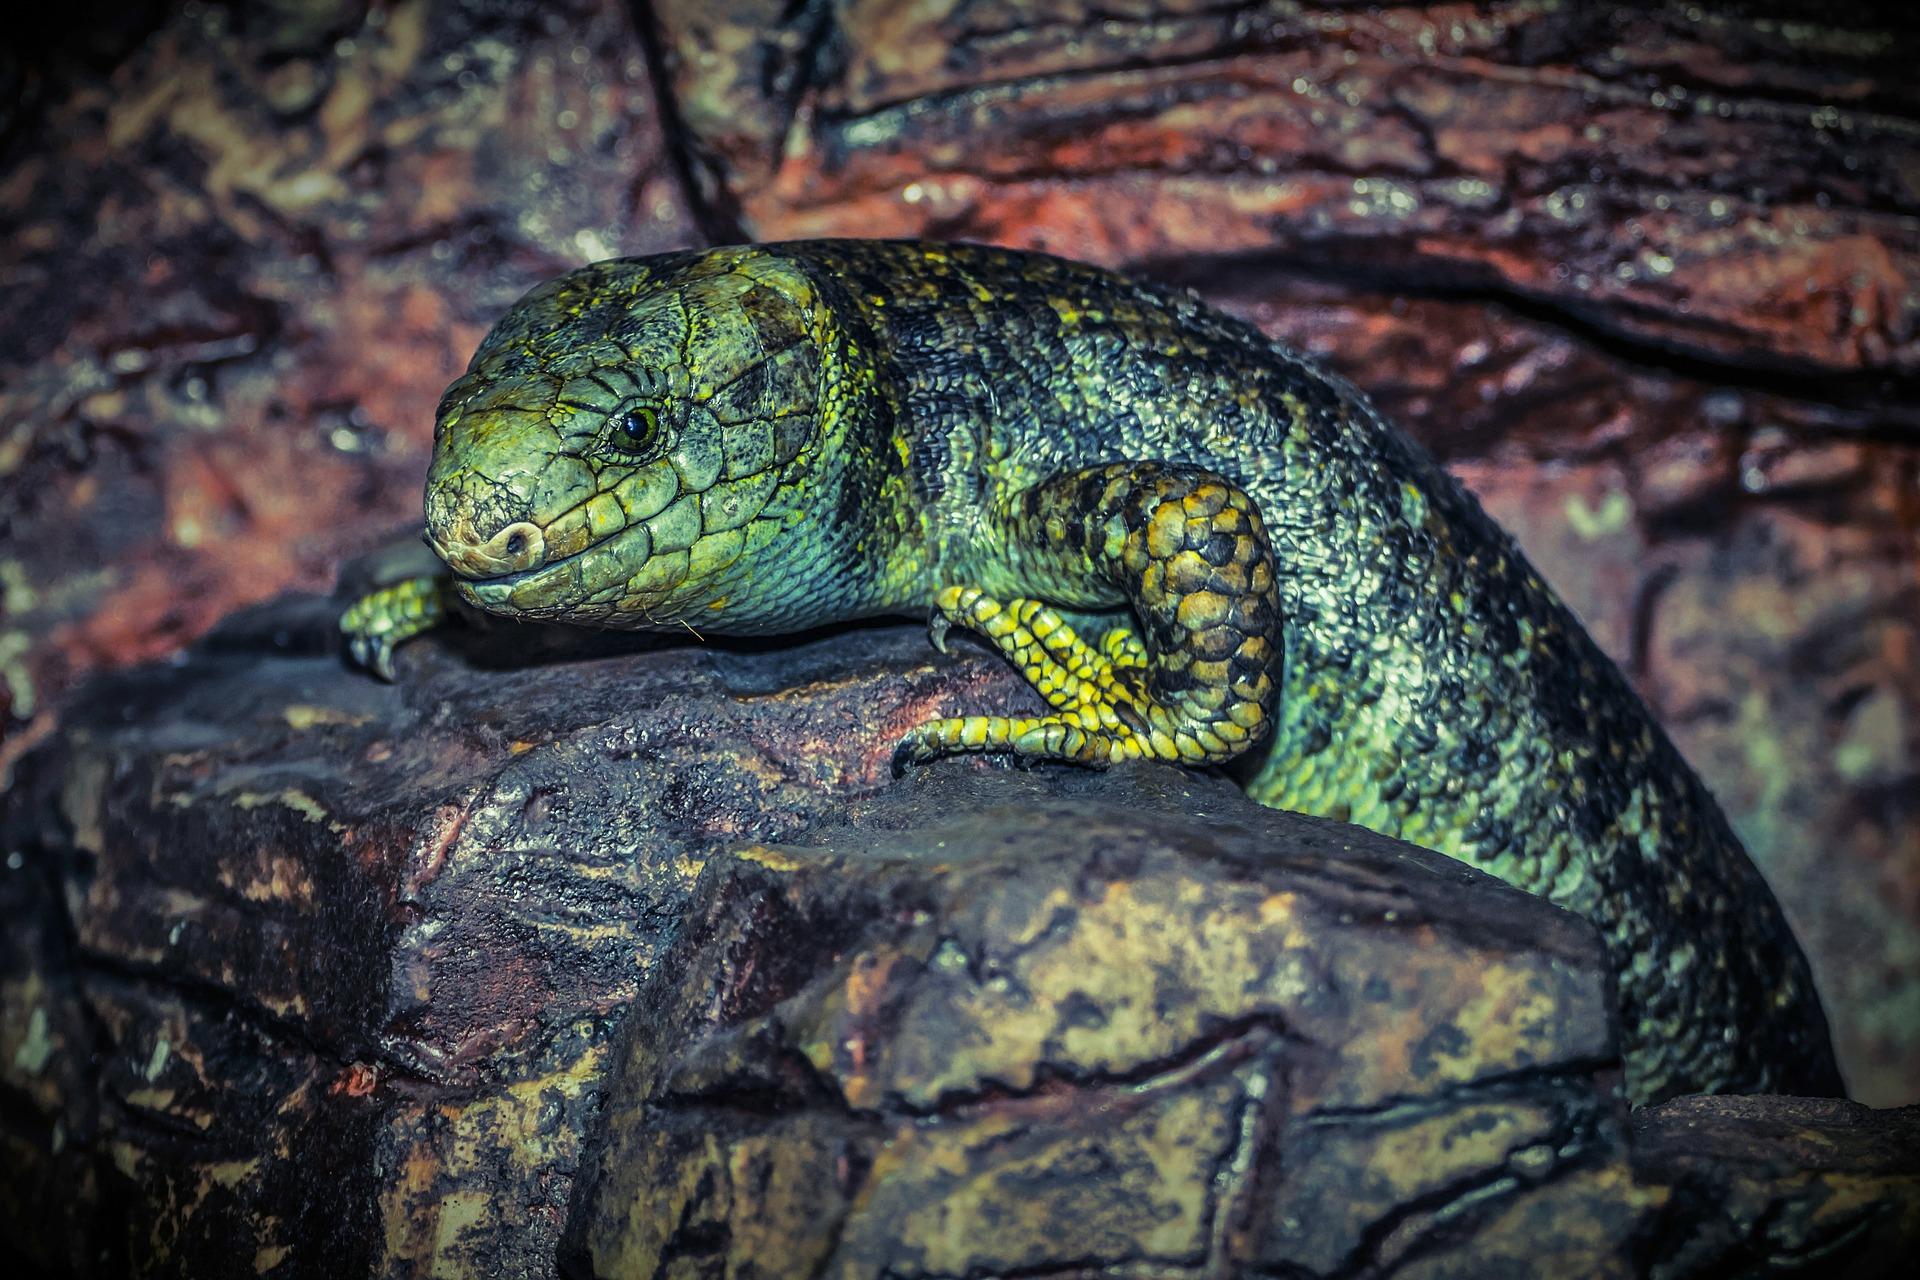 lagarto, reptil, rocas, relax, verde - Fondos de Pantalla HD - professor-falken.com